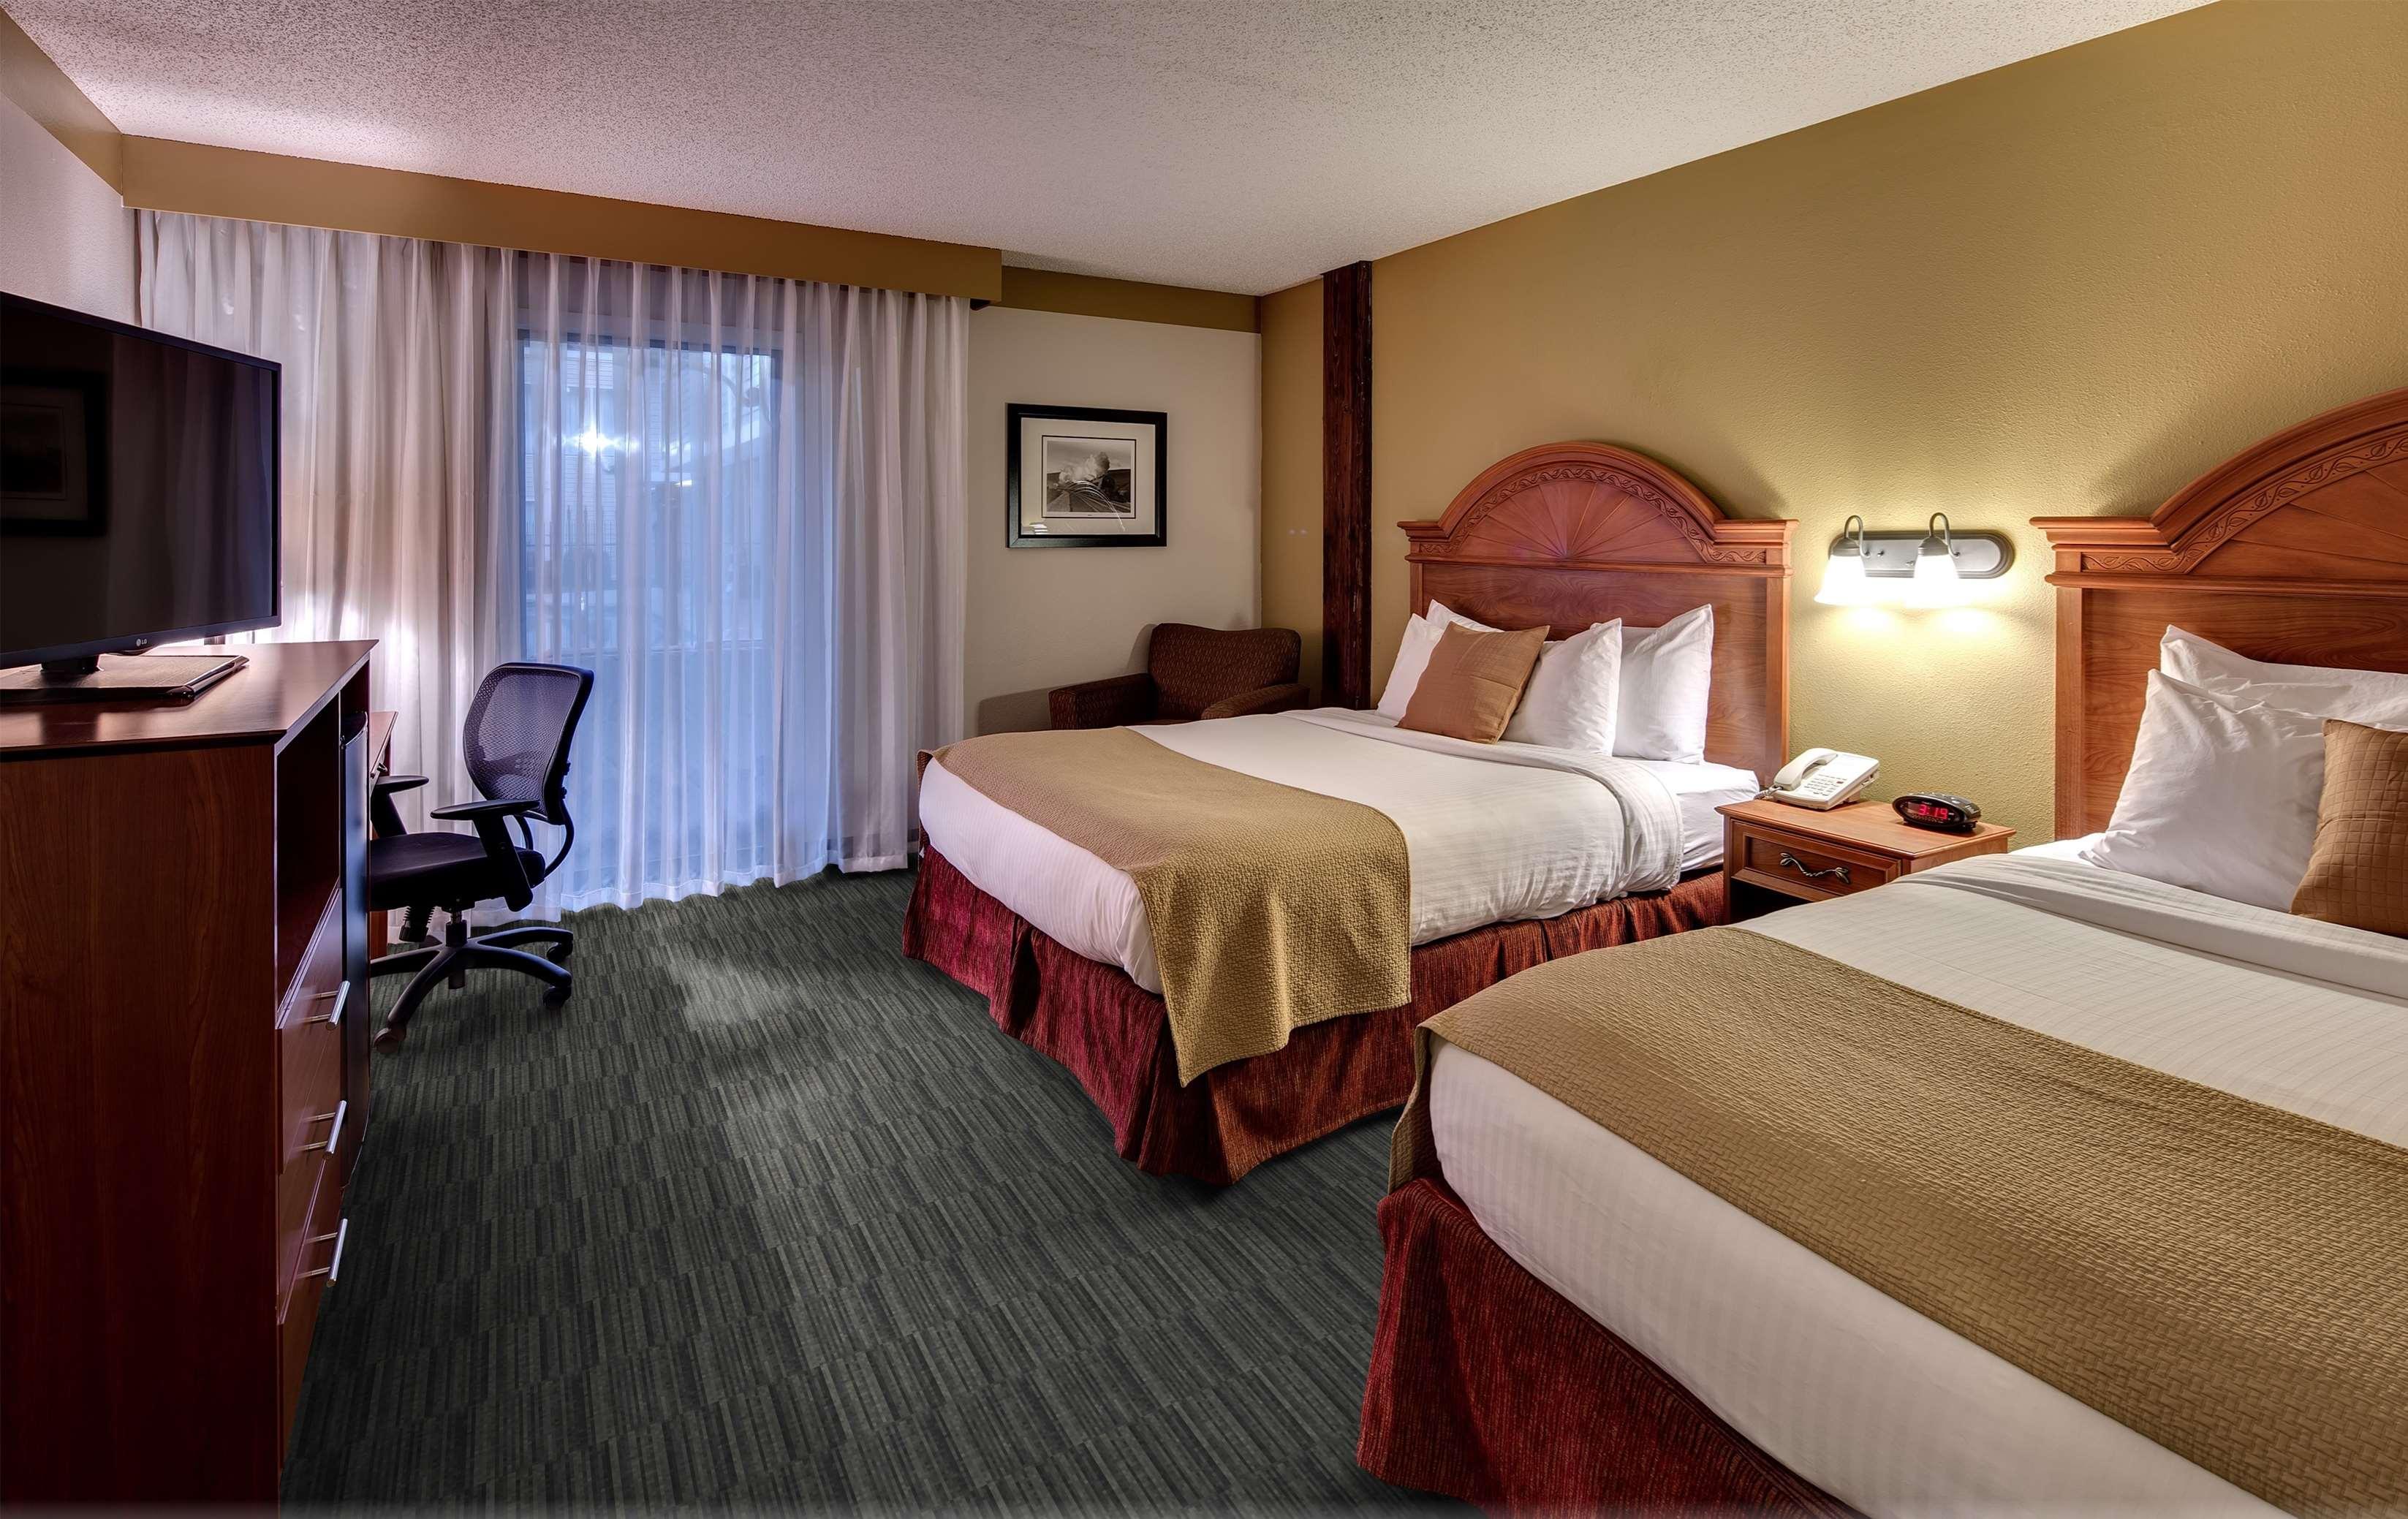 Best Western Plus Como Park Hotel image 21